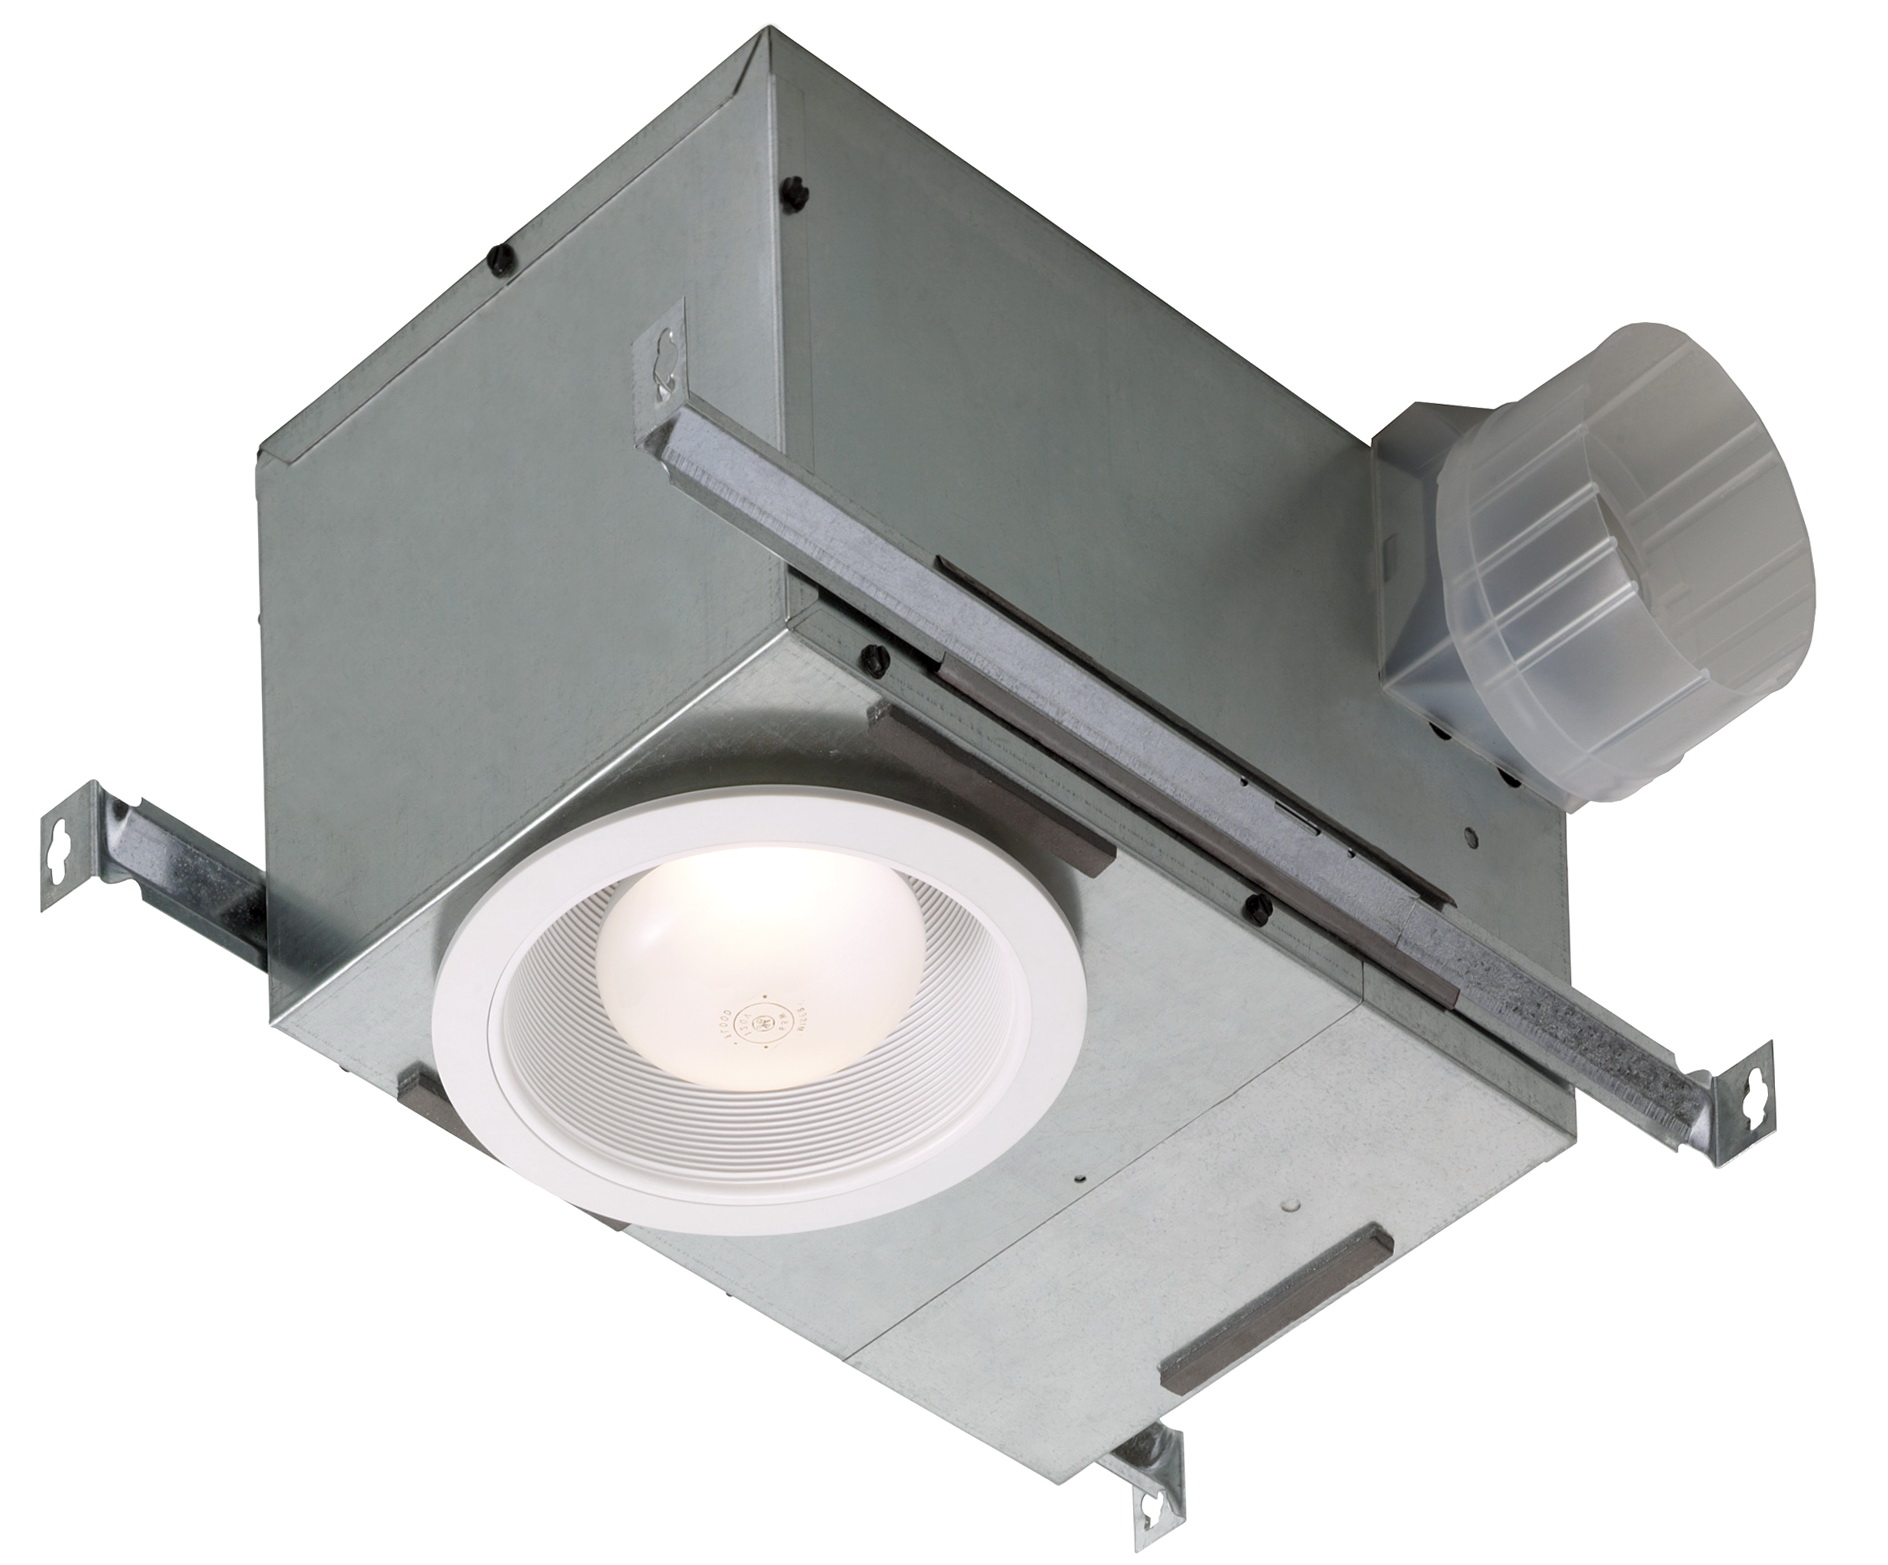 Bathroom Vent Fan Light Combo